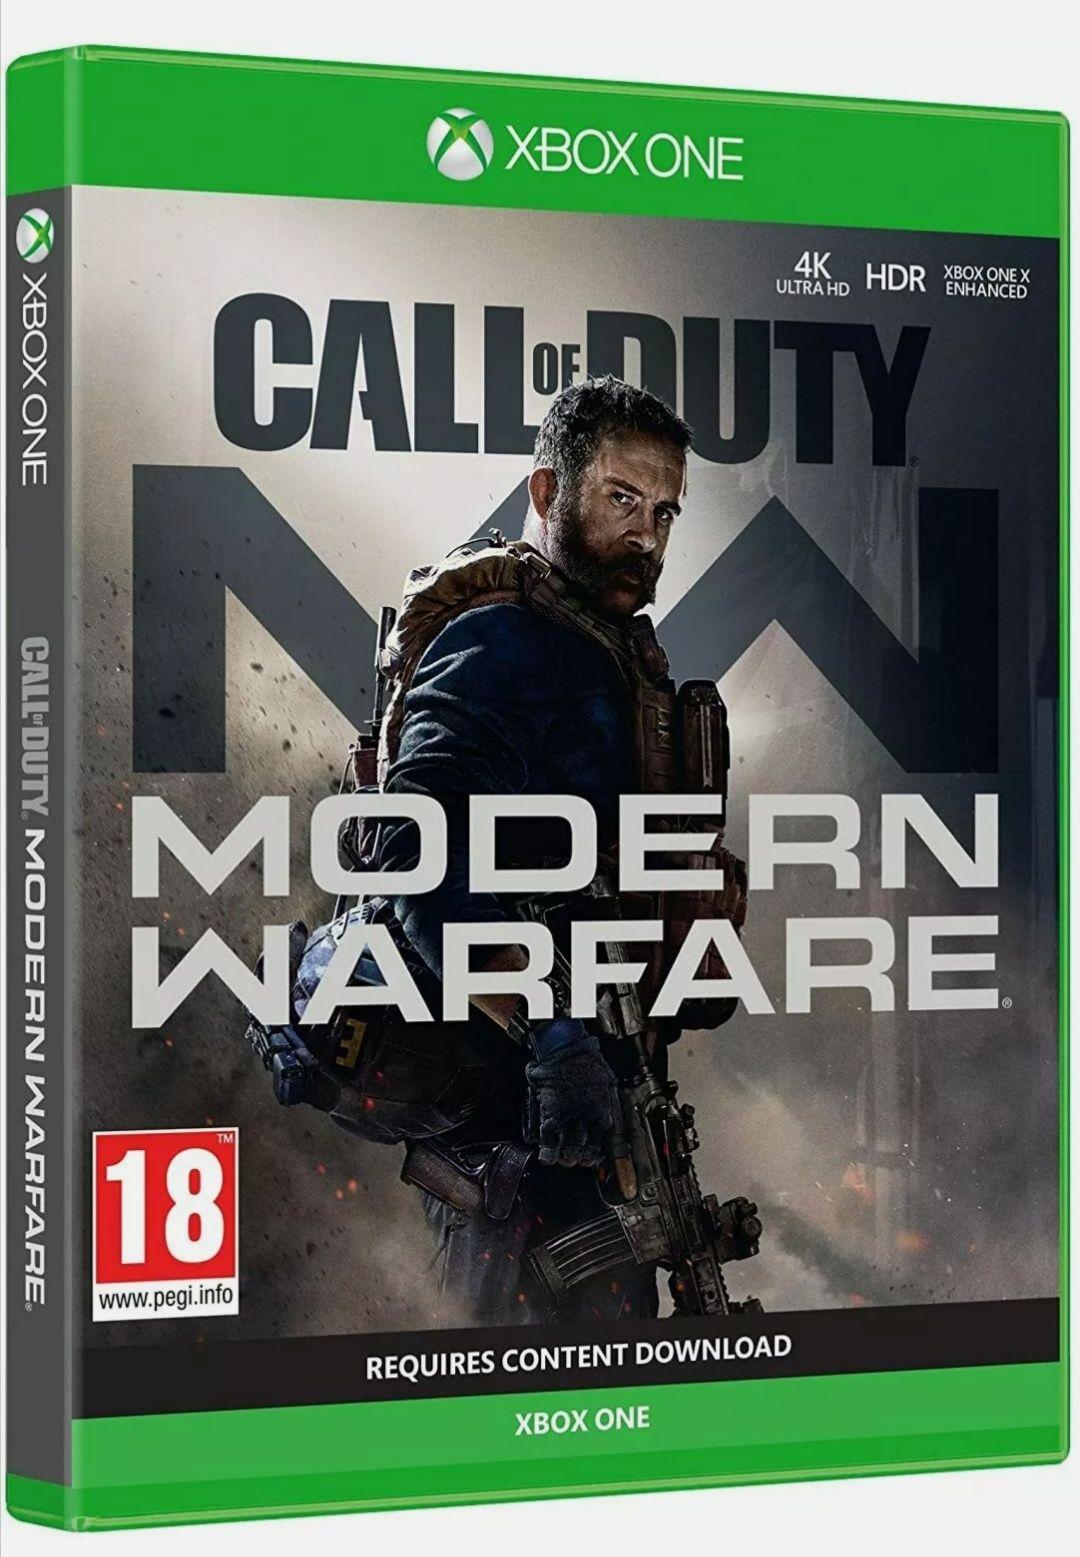 Call of Duty Modern Warfare Xbox One Used like new - £26.99 @ stockmustgo / ebay